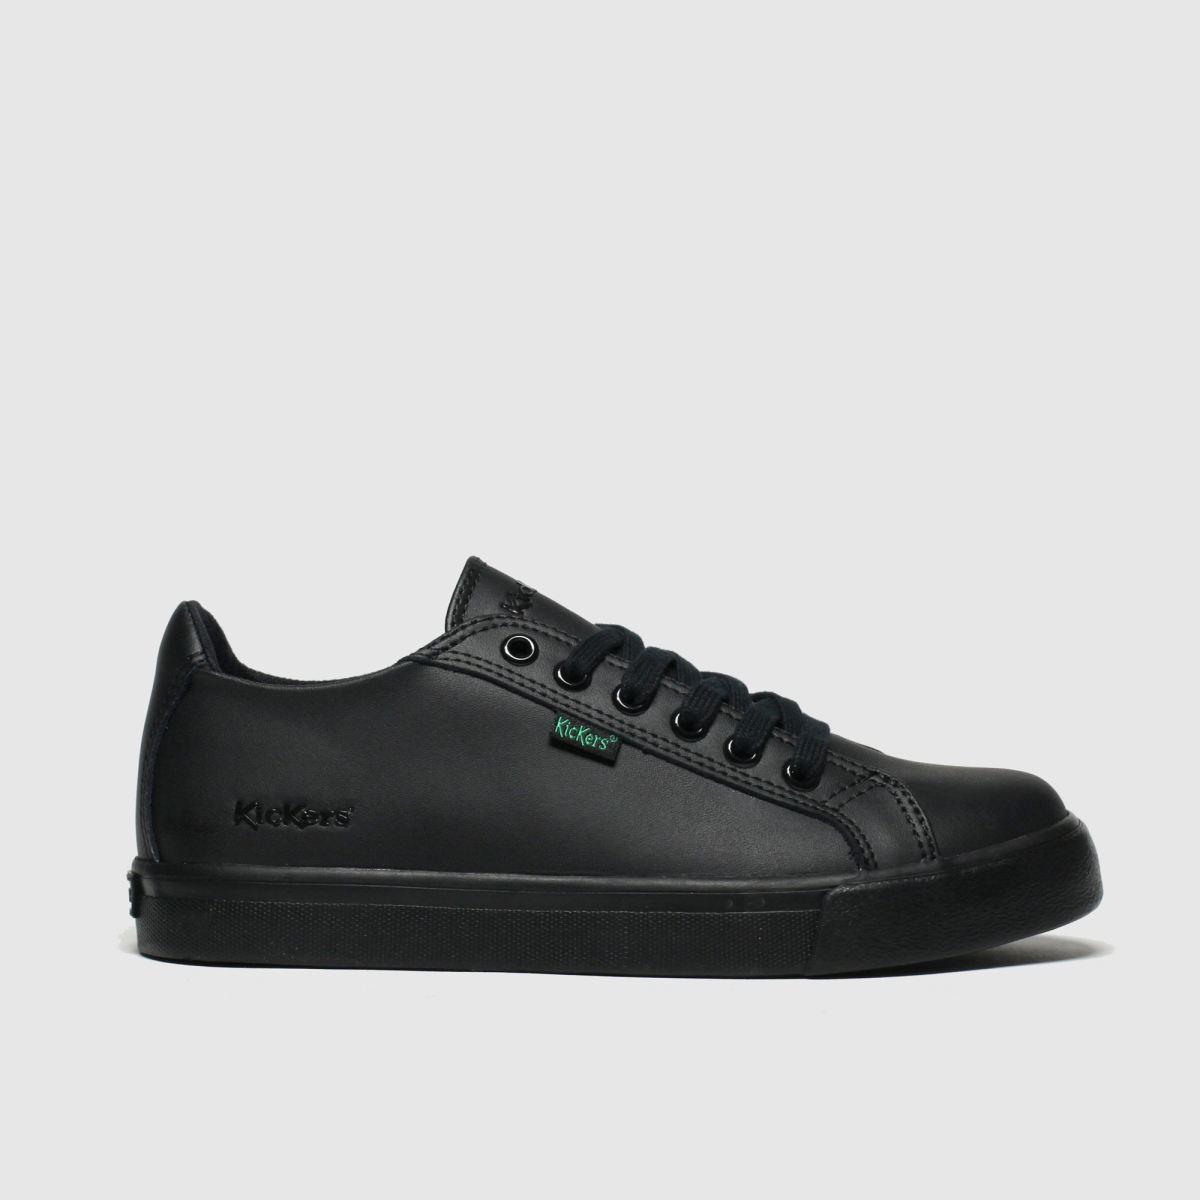 Kickers Black Tovni Lacer Shoes Junior